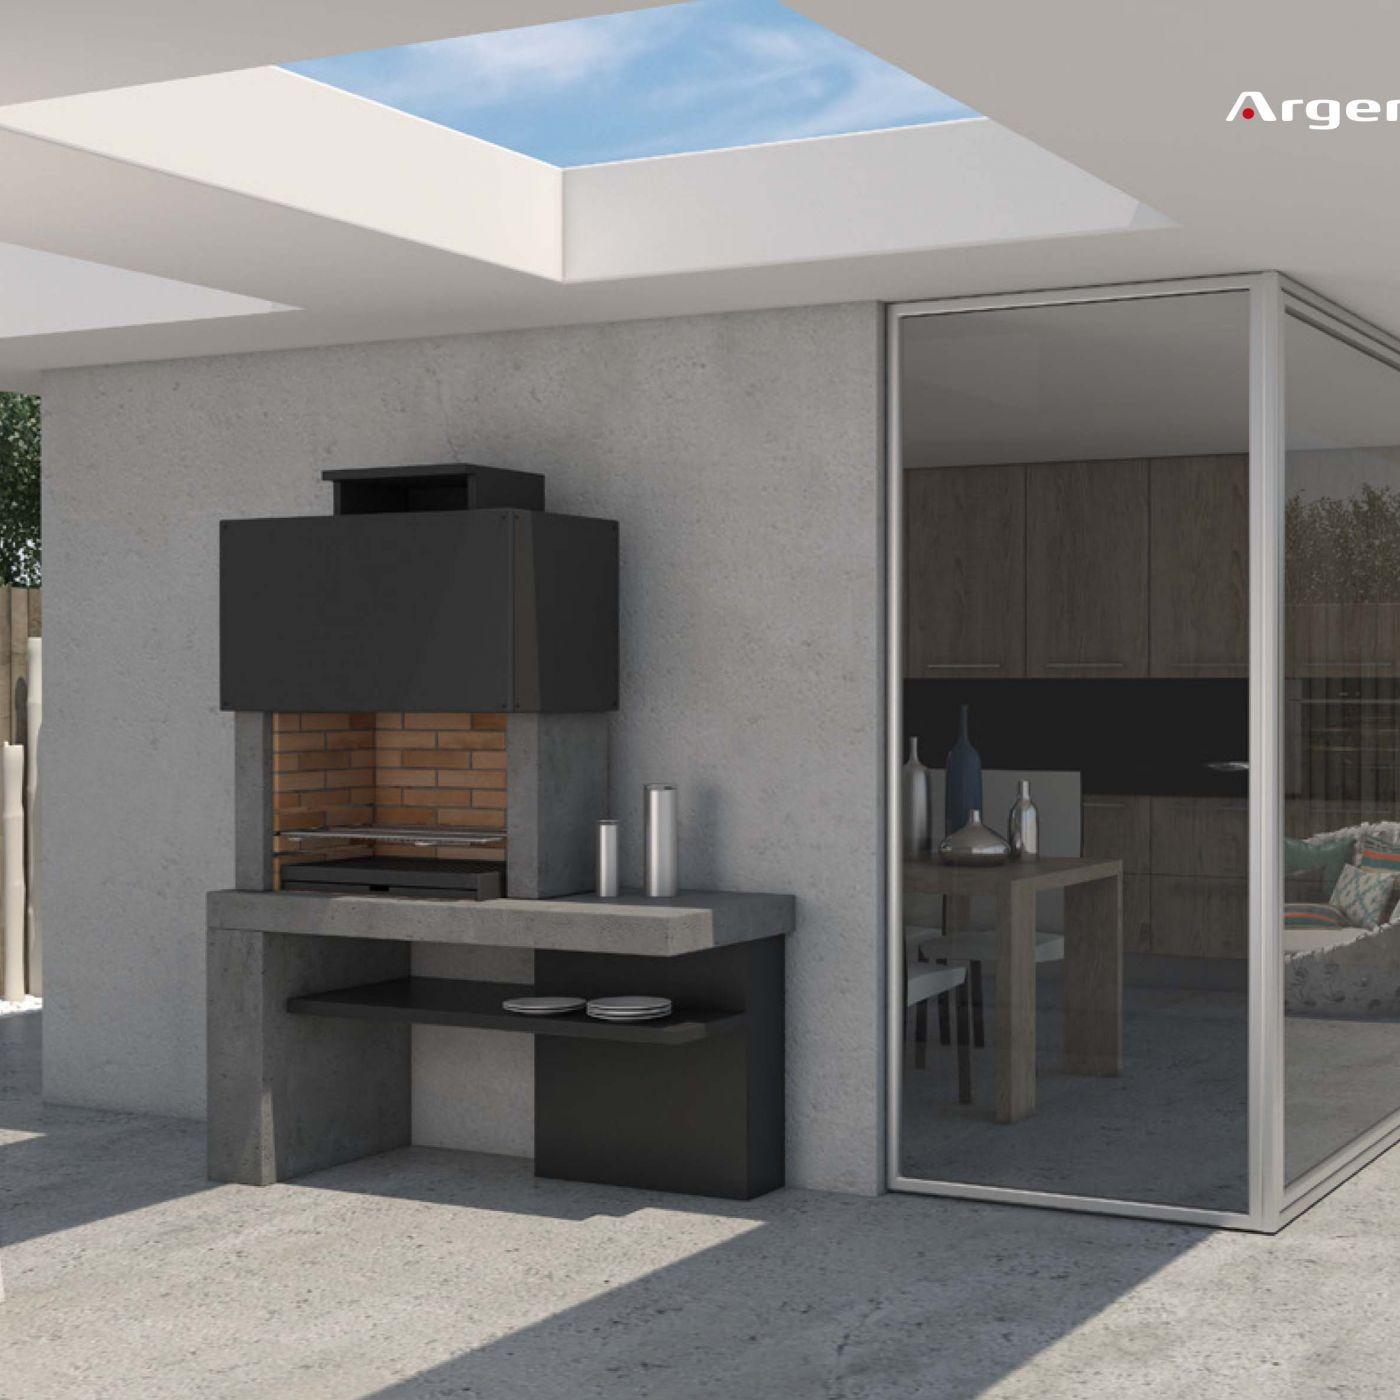 Monaco parrilla pinterest asador terrazas y planos for Asador en patio pequeno